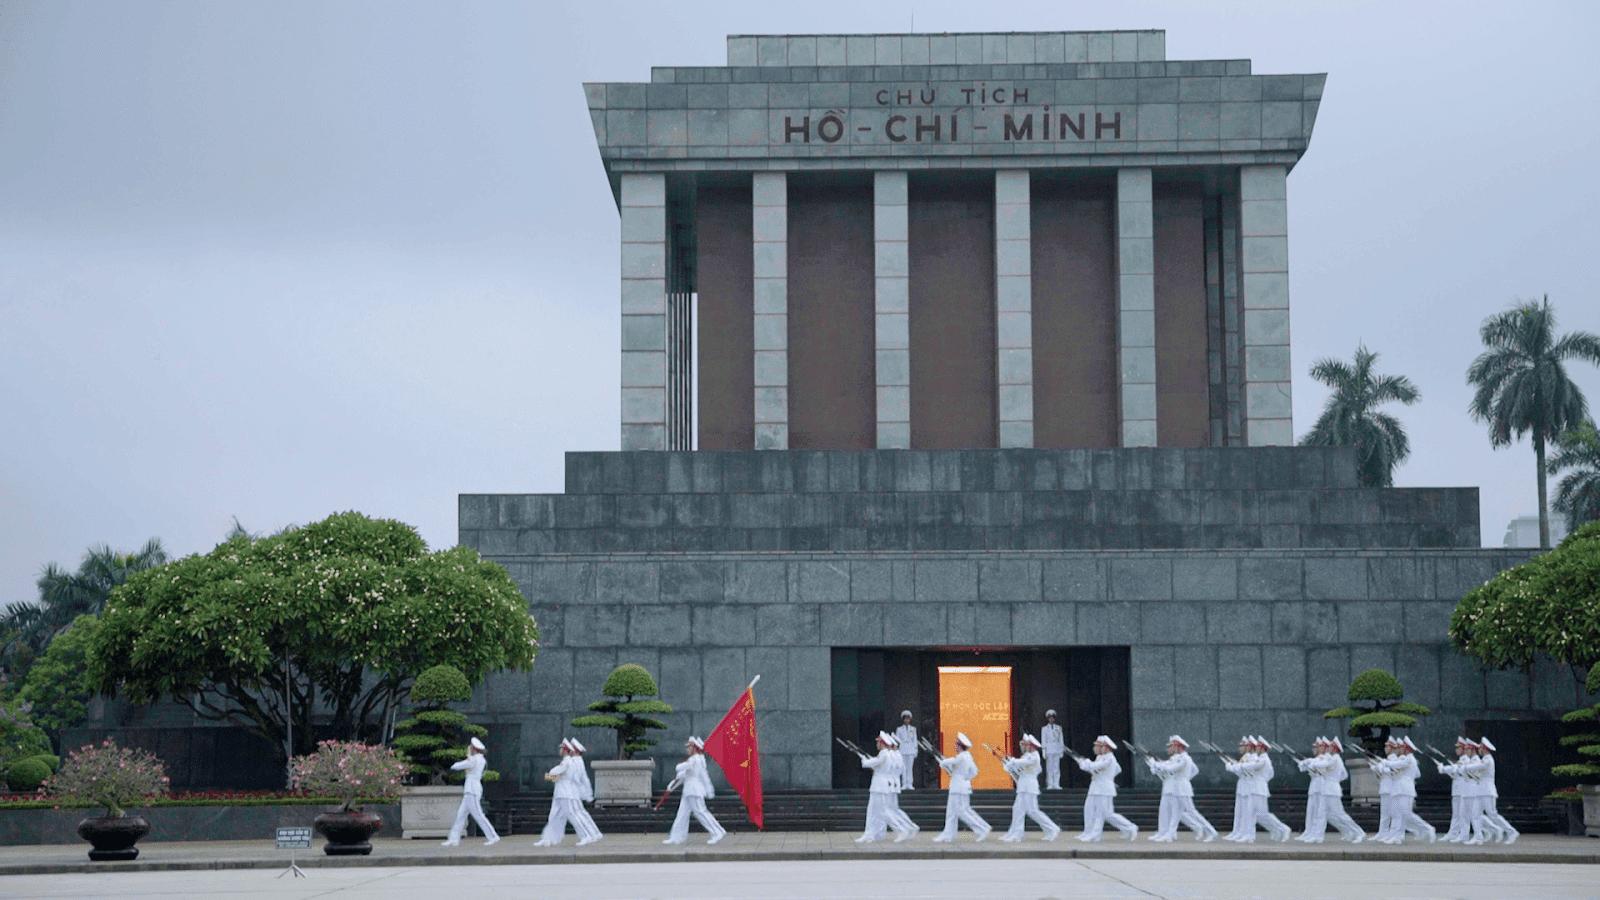 Ho Chi Minh Mausoleum in Ha Noi